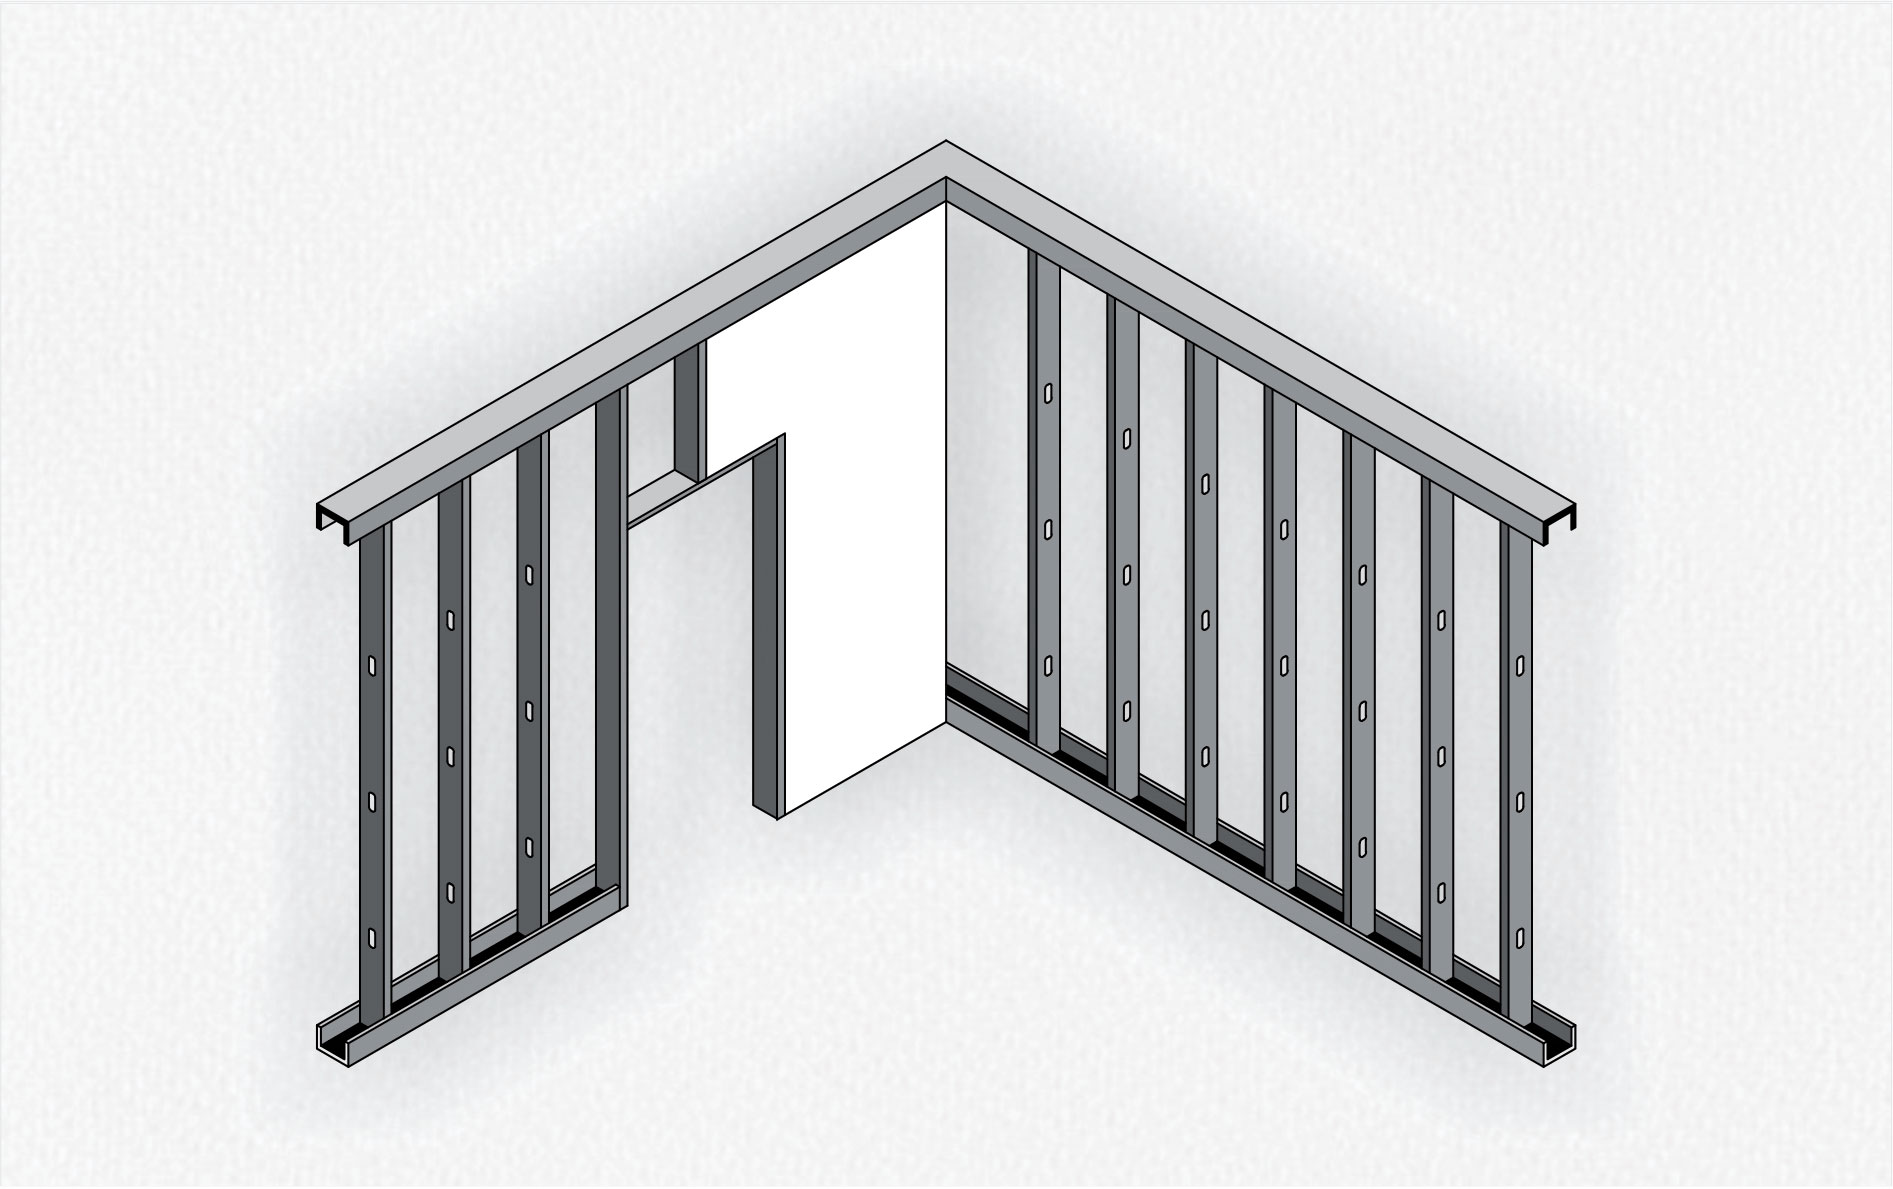 sistema constructivo steel frame